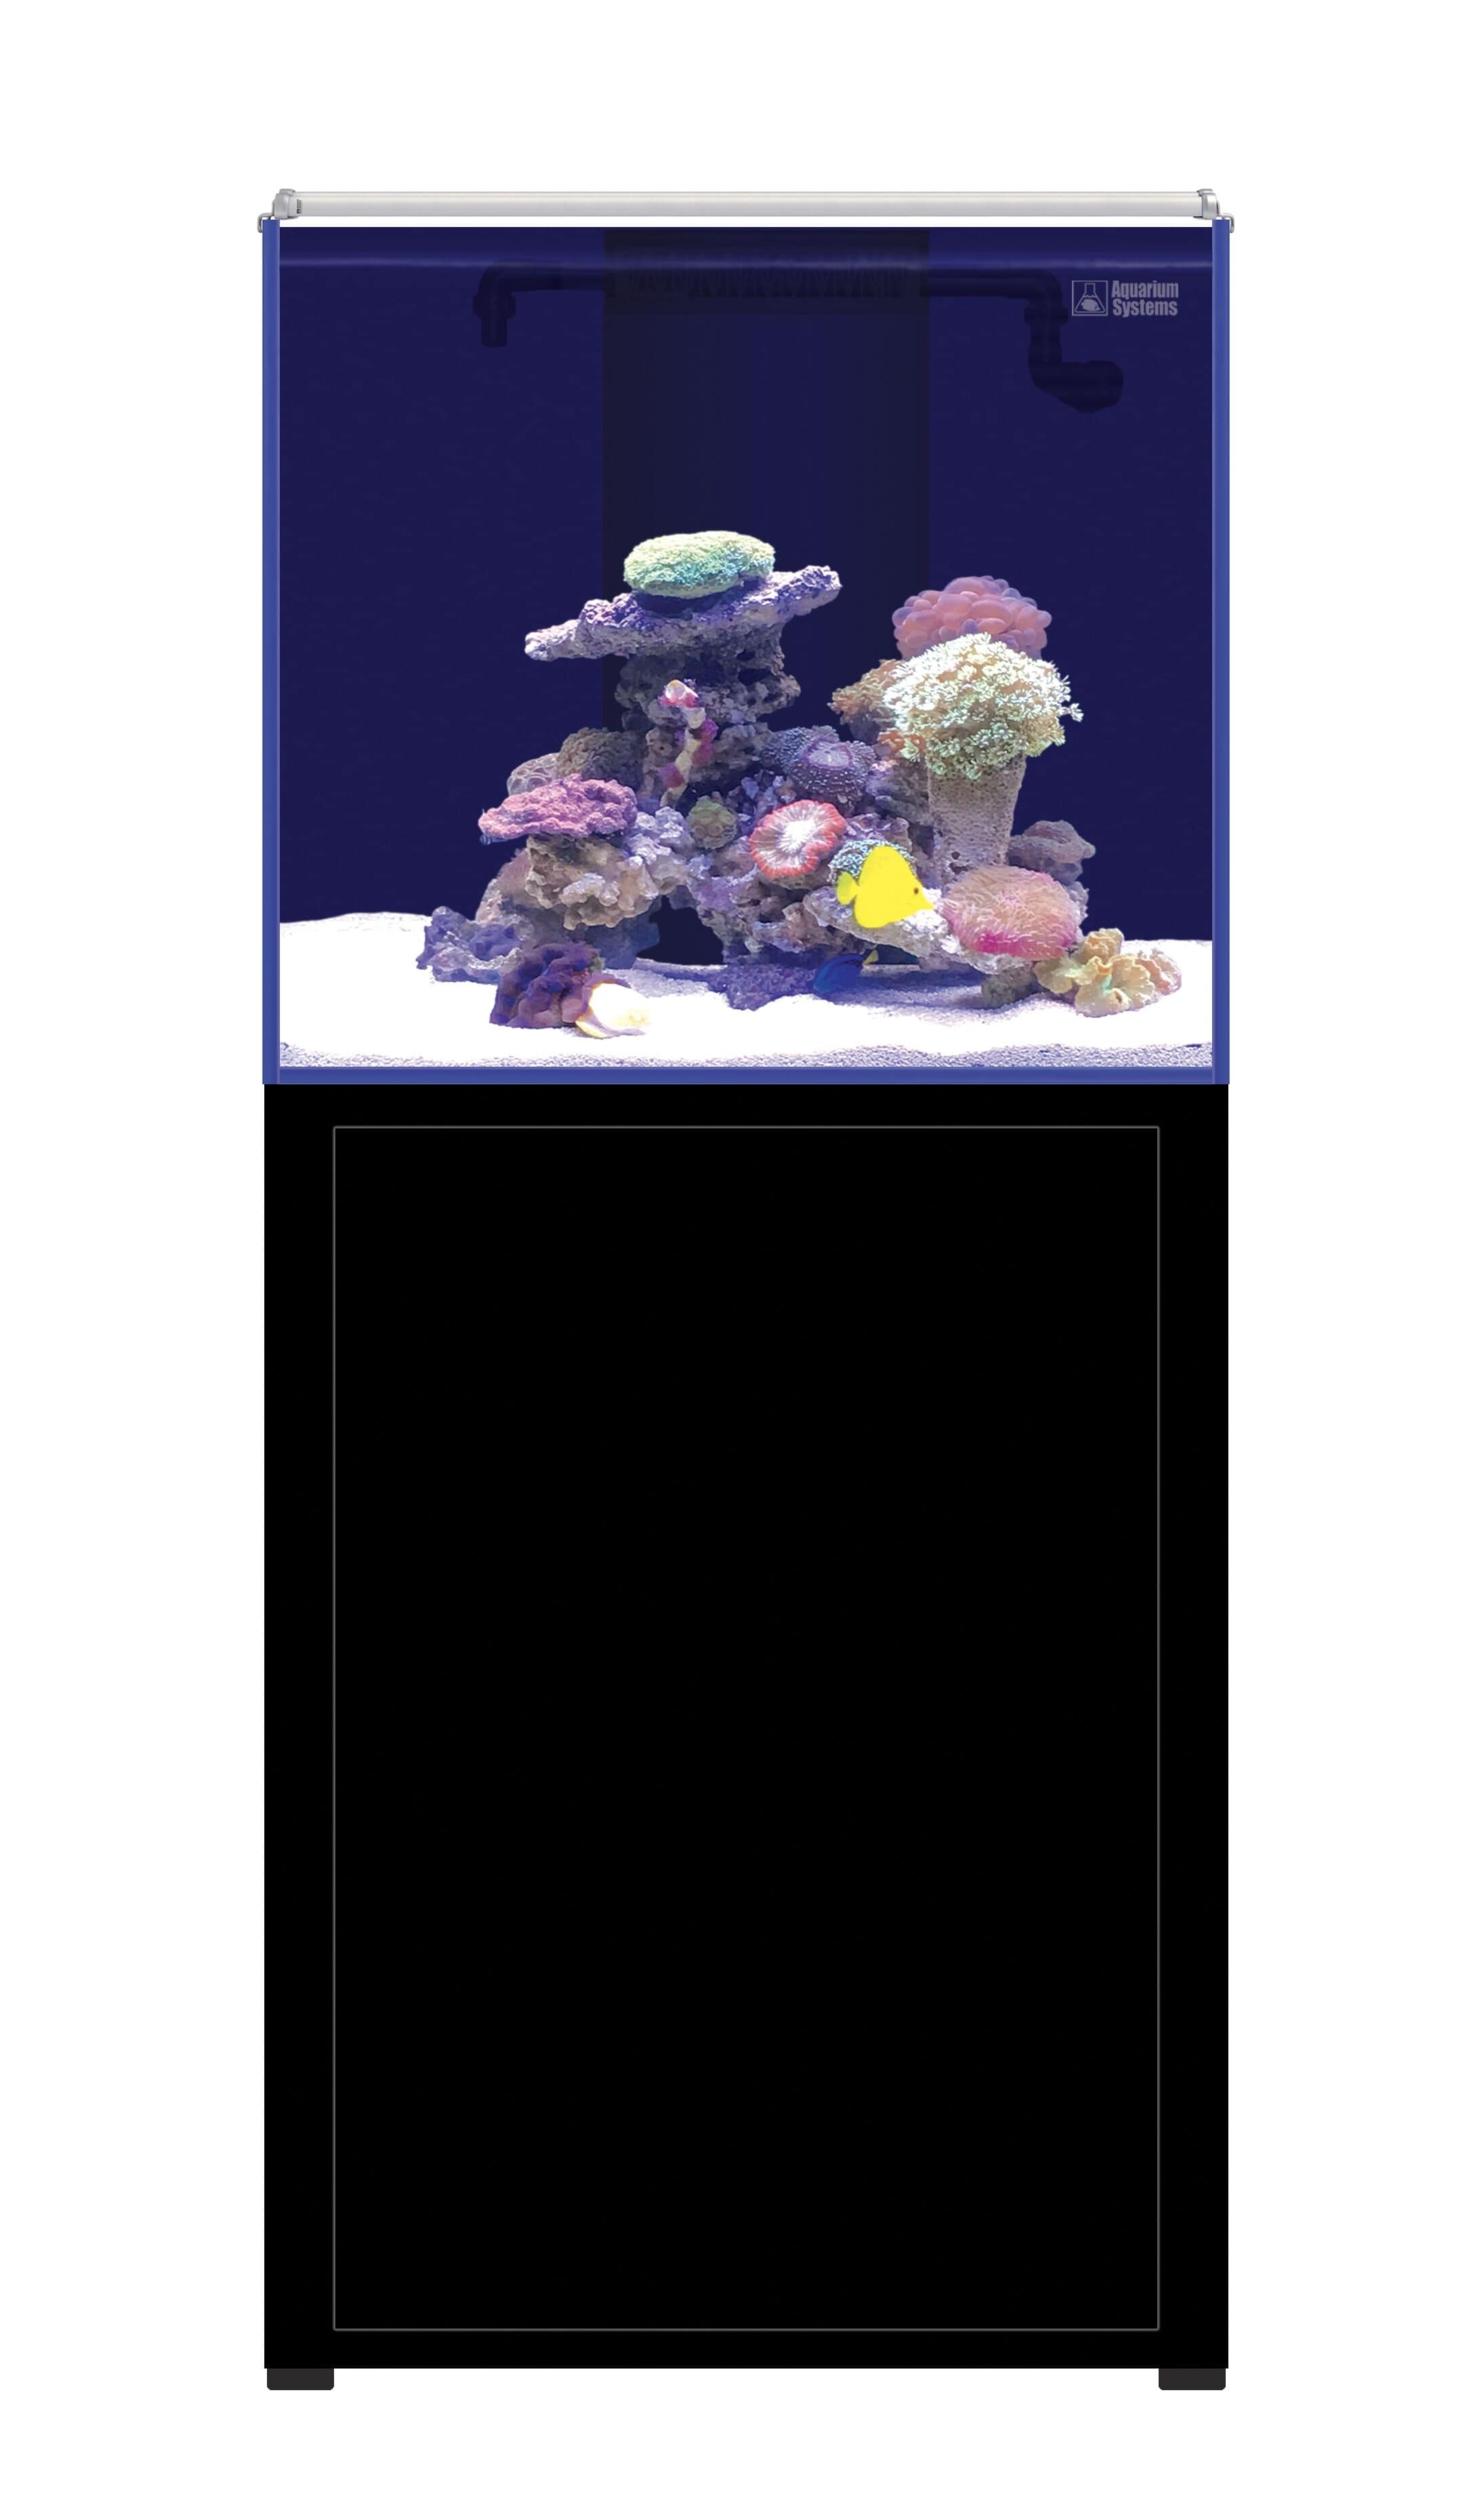 AQUARIUM SYSTEMS L\'Aquarium 250 Noir version 2.0 combinaison aquarium 162 L et meuble